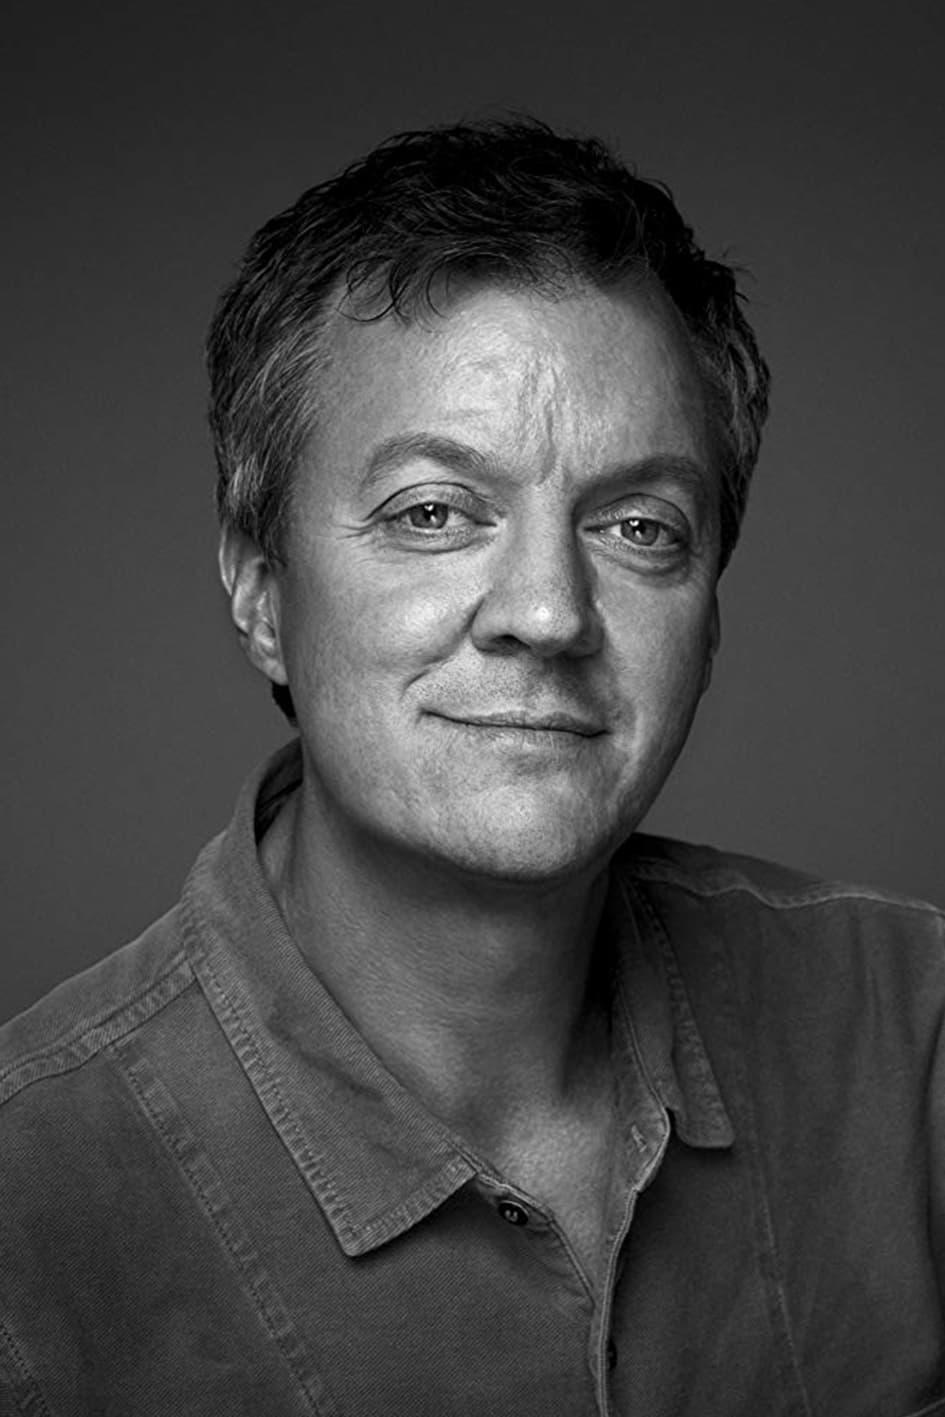 Johan Brisinger